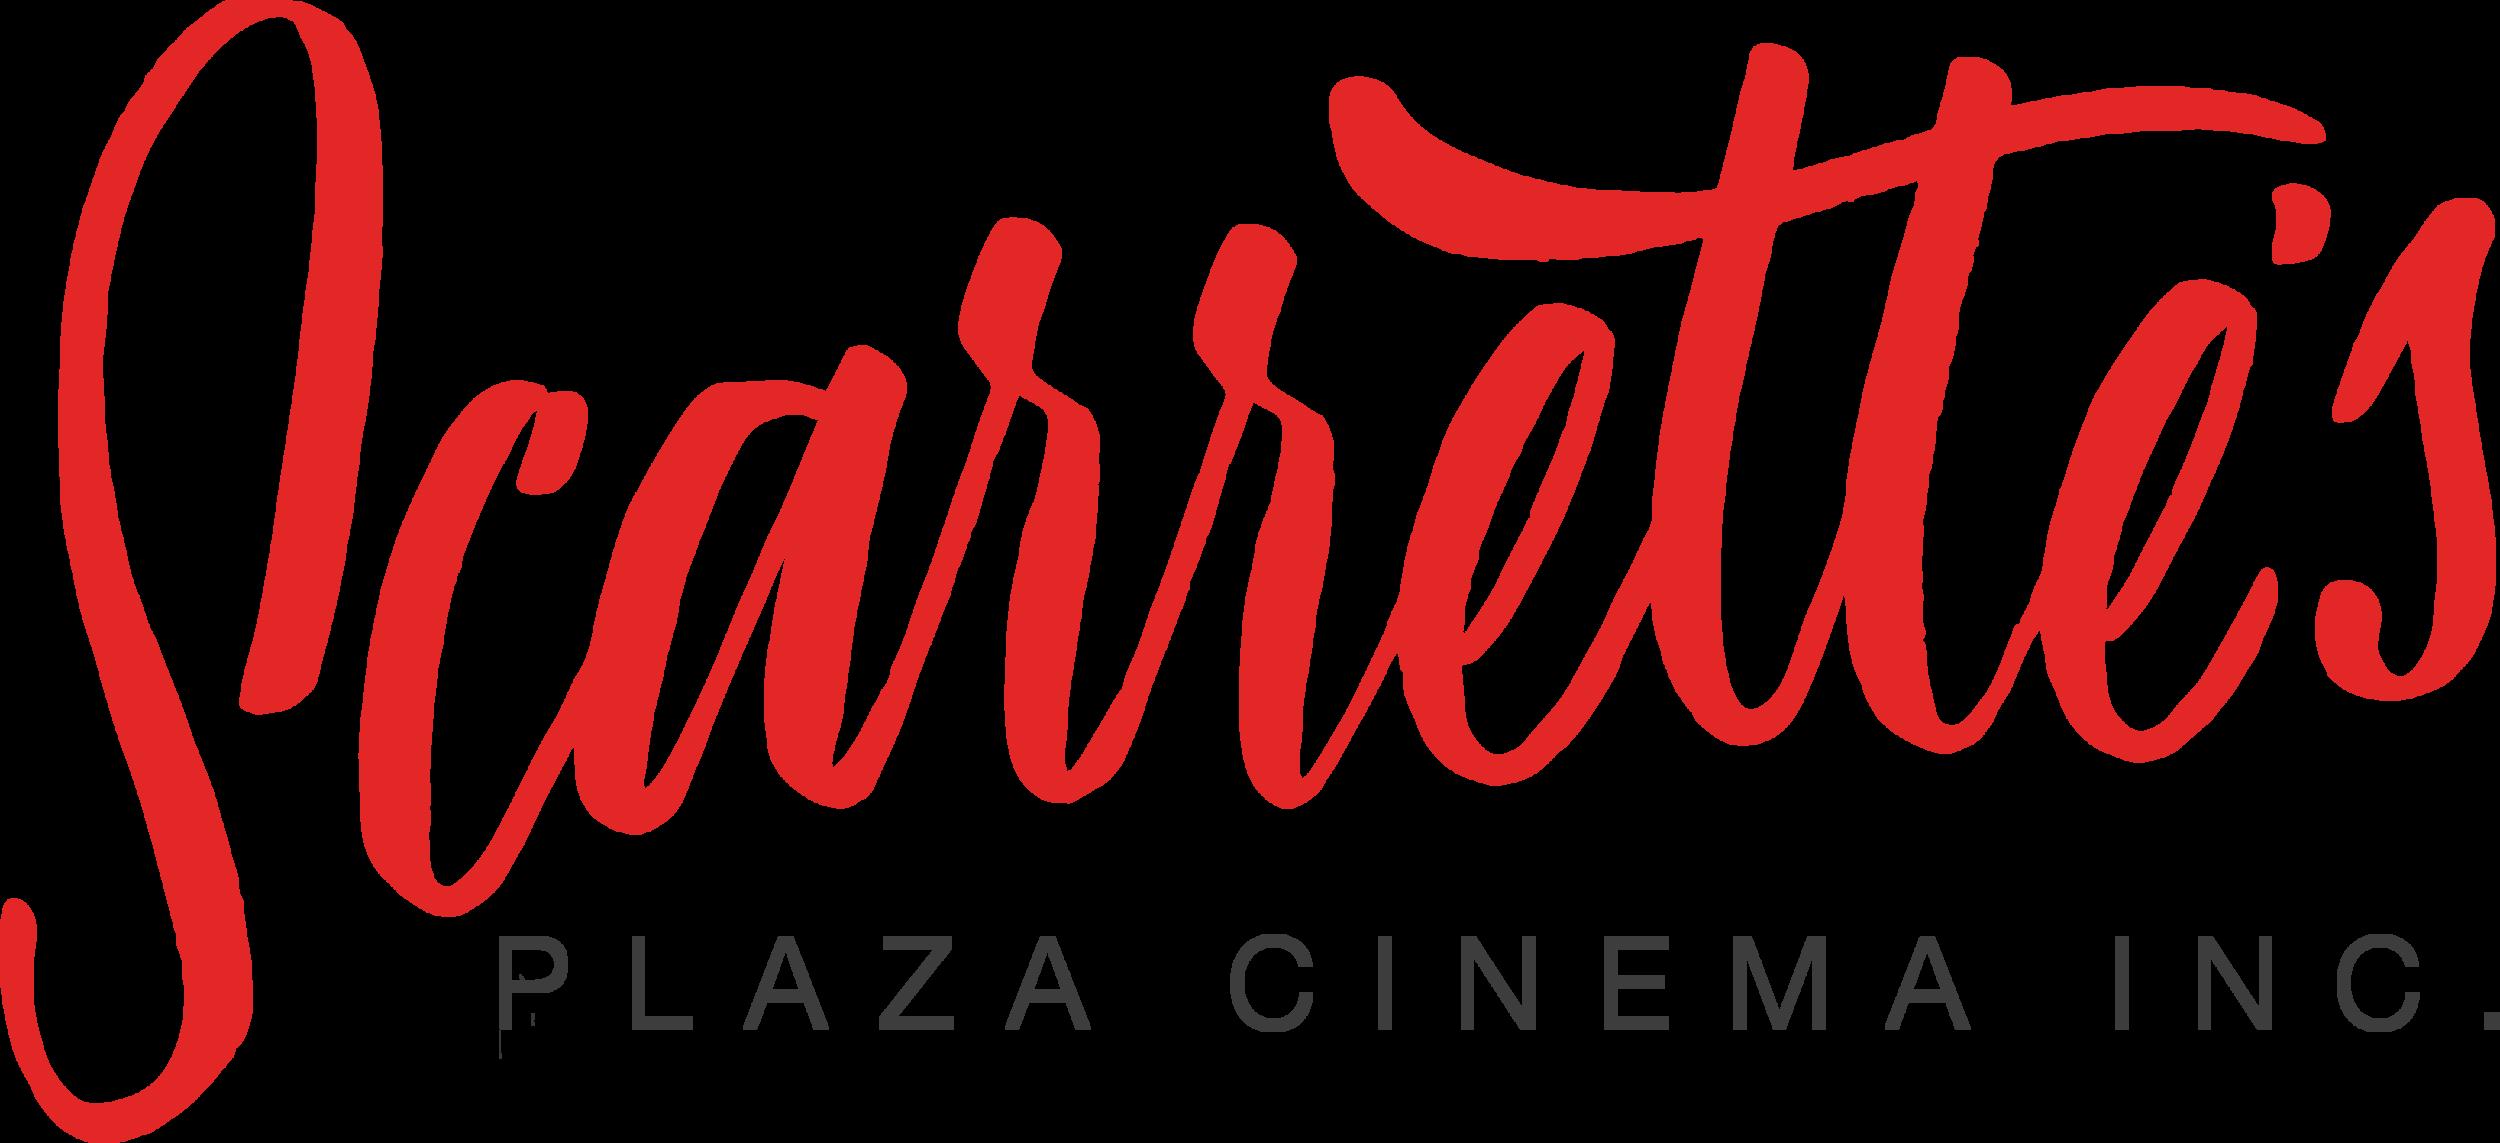 Scarrette's Radford Plaza Cinema Logo by Nineteen54